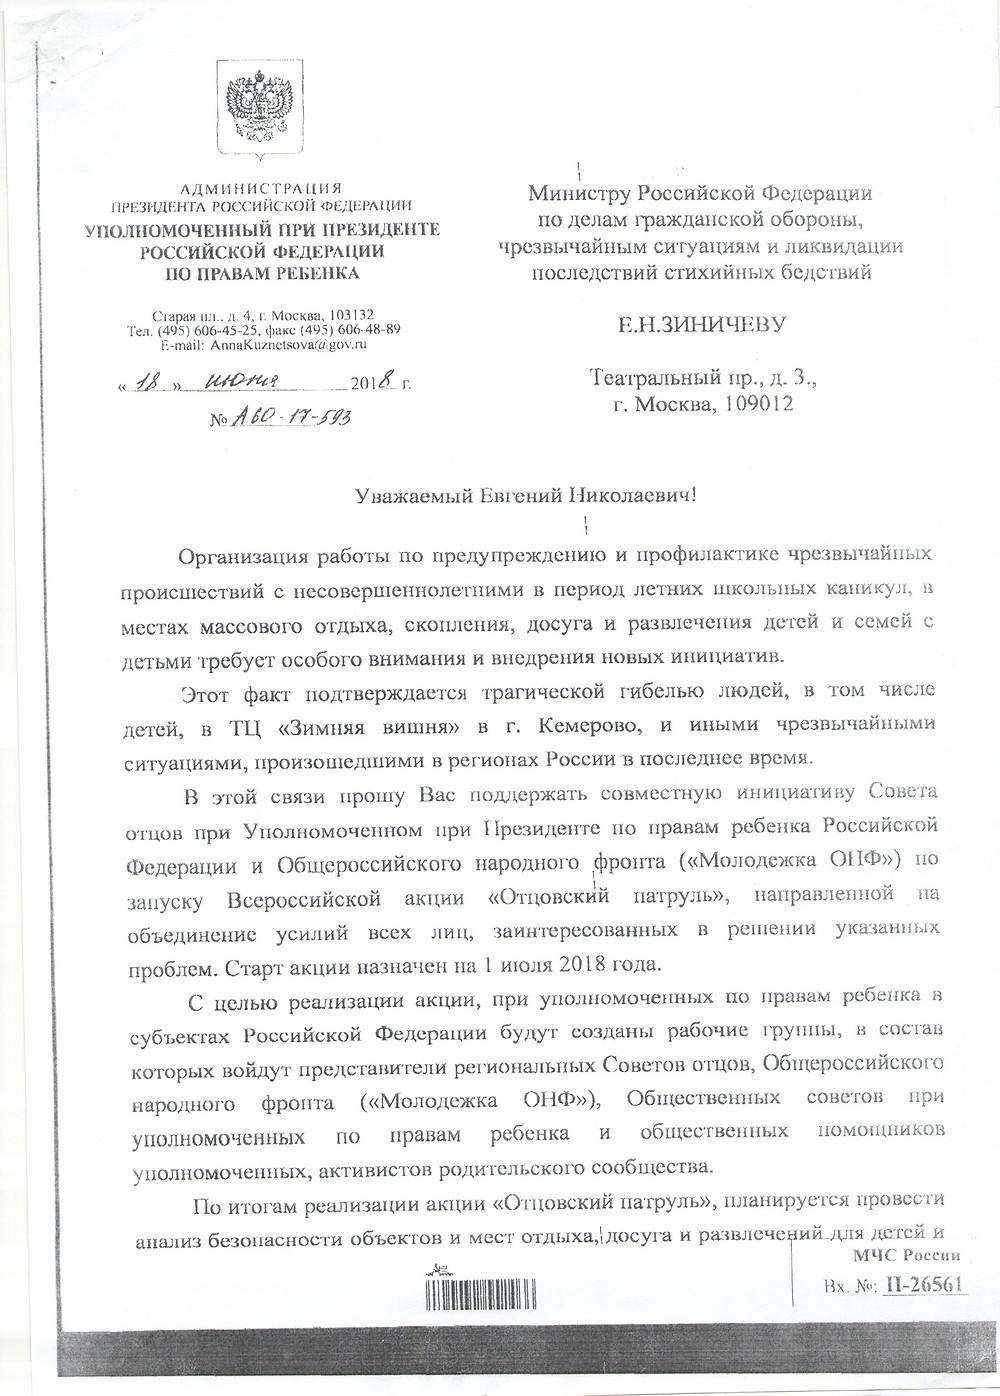 pismo-ministru-mchs-zinichevu-en-o-realizacii-akcii-otcovskij-patrul